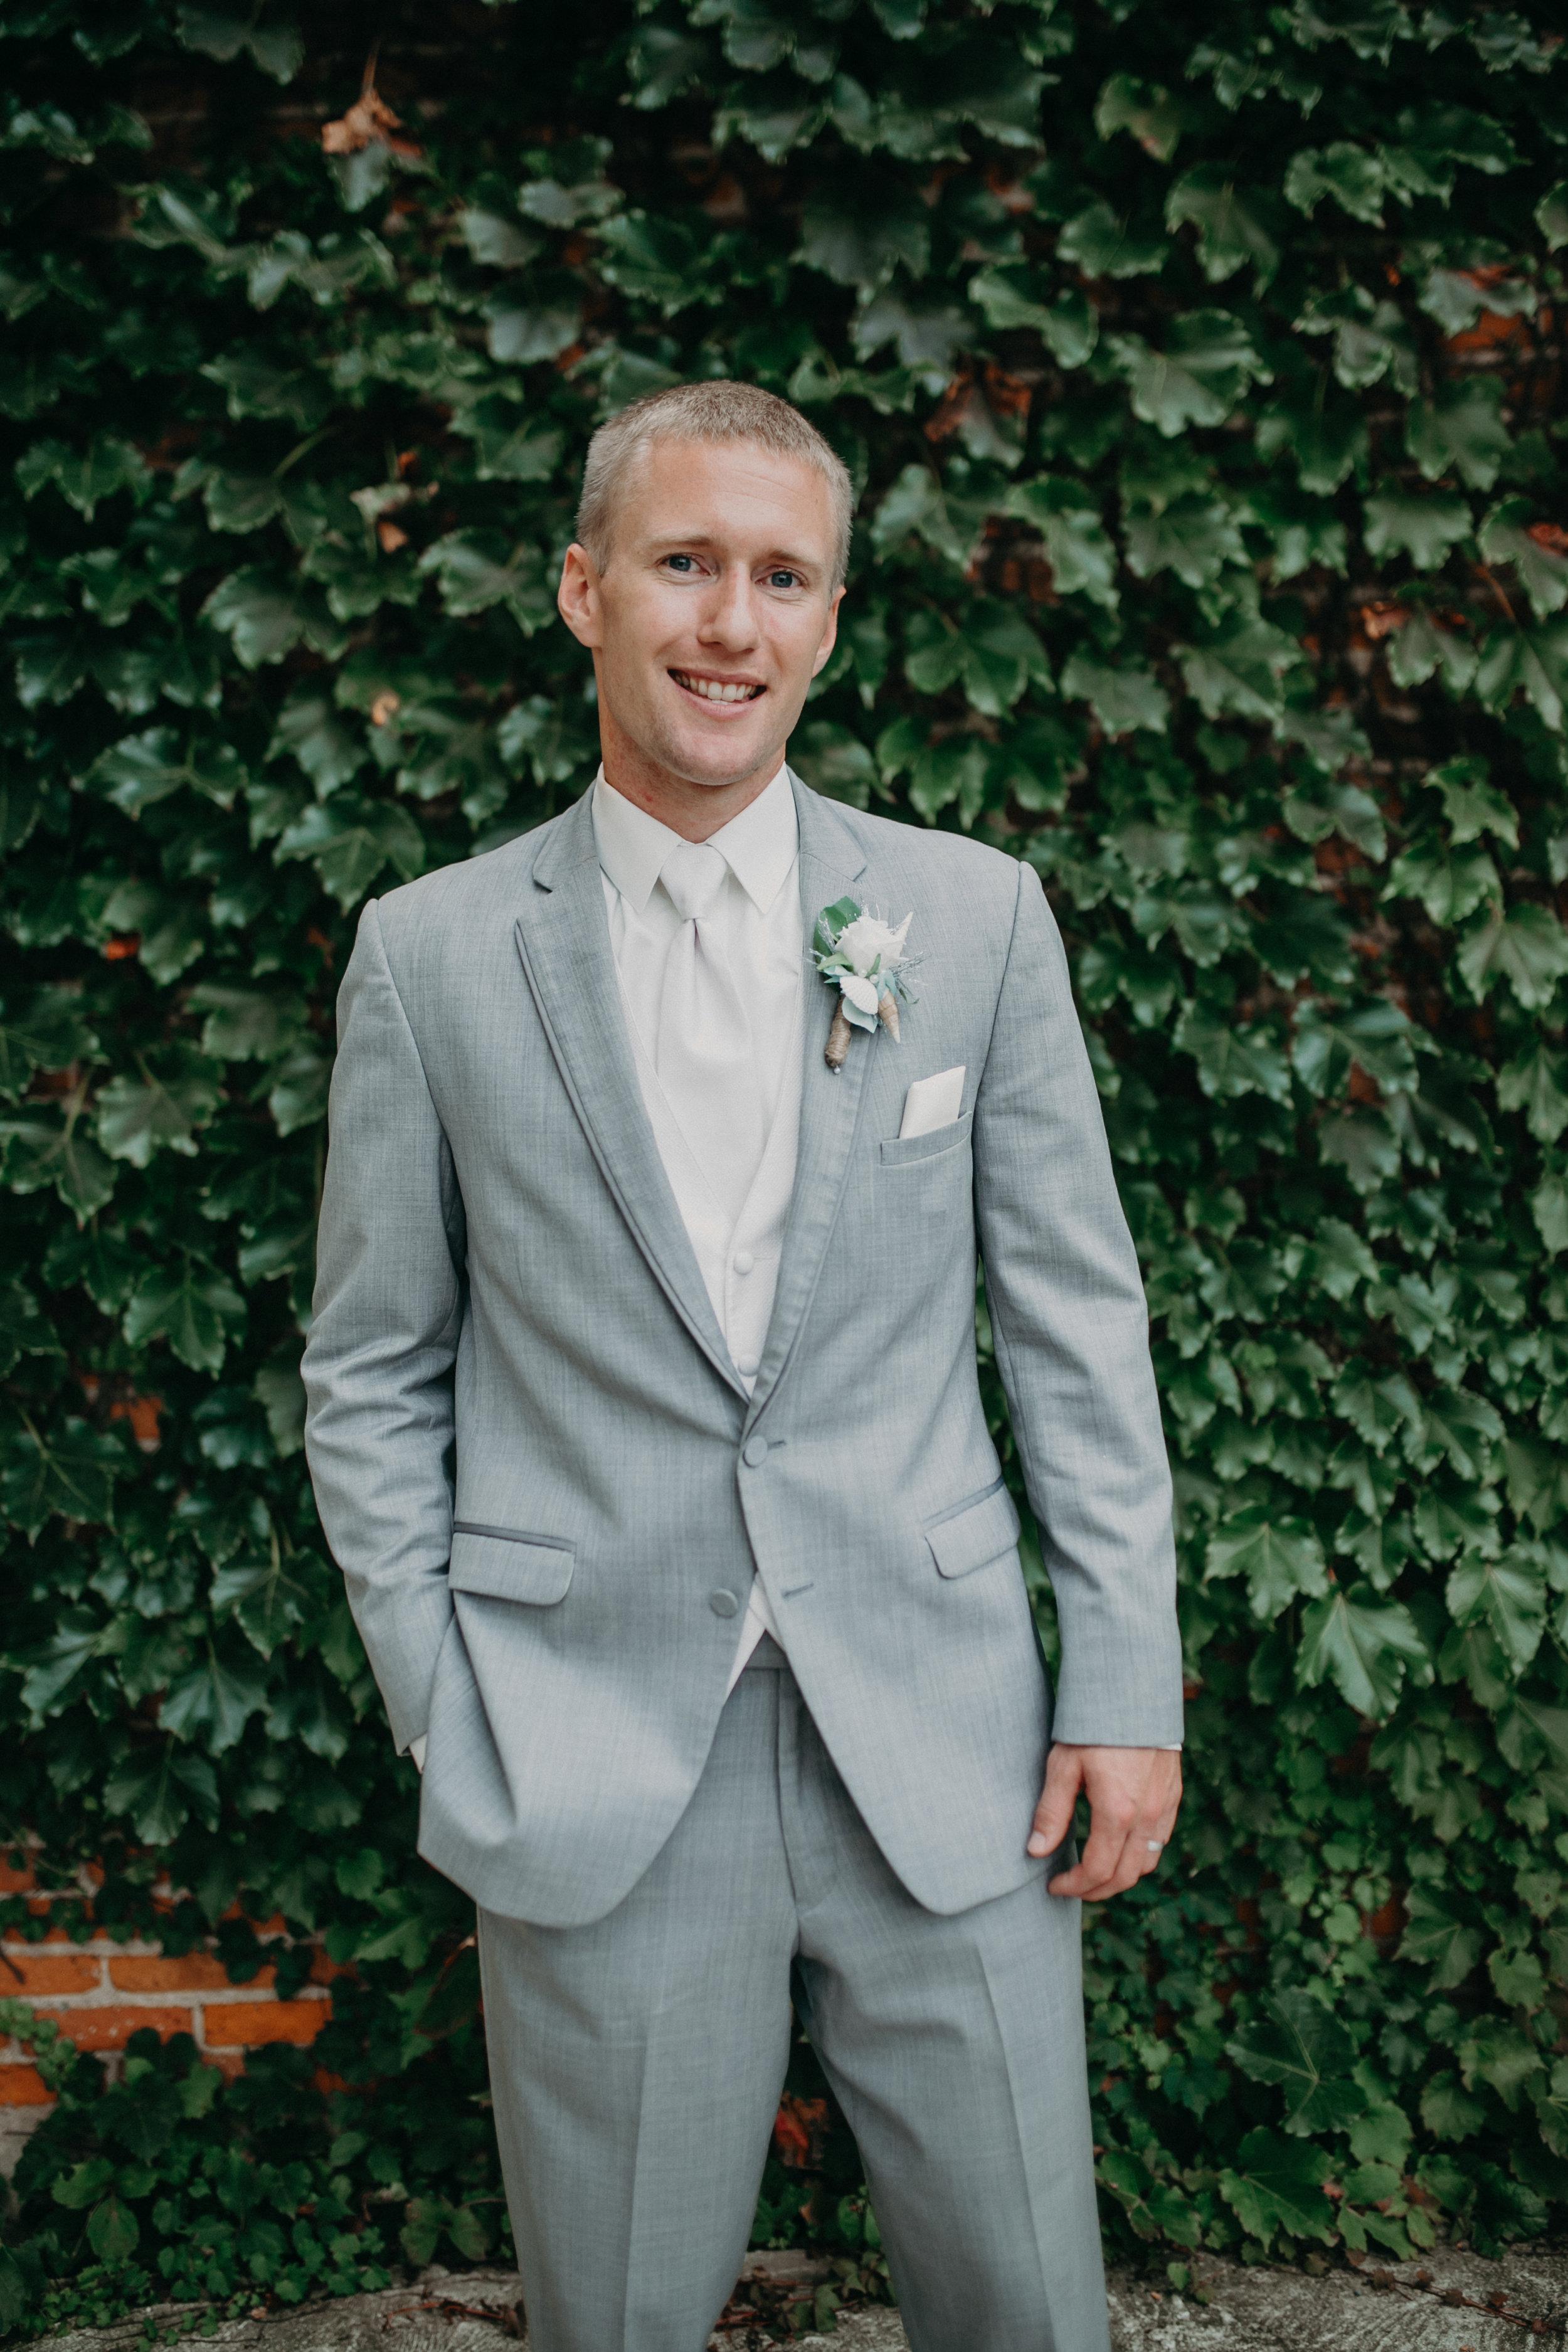 Jake-lenz-groom-marshfield-wi-wedding-photographer